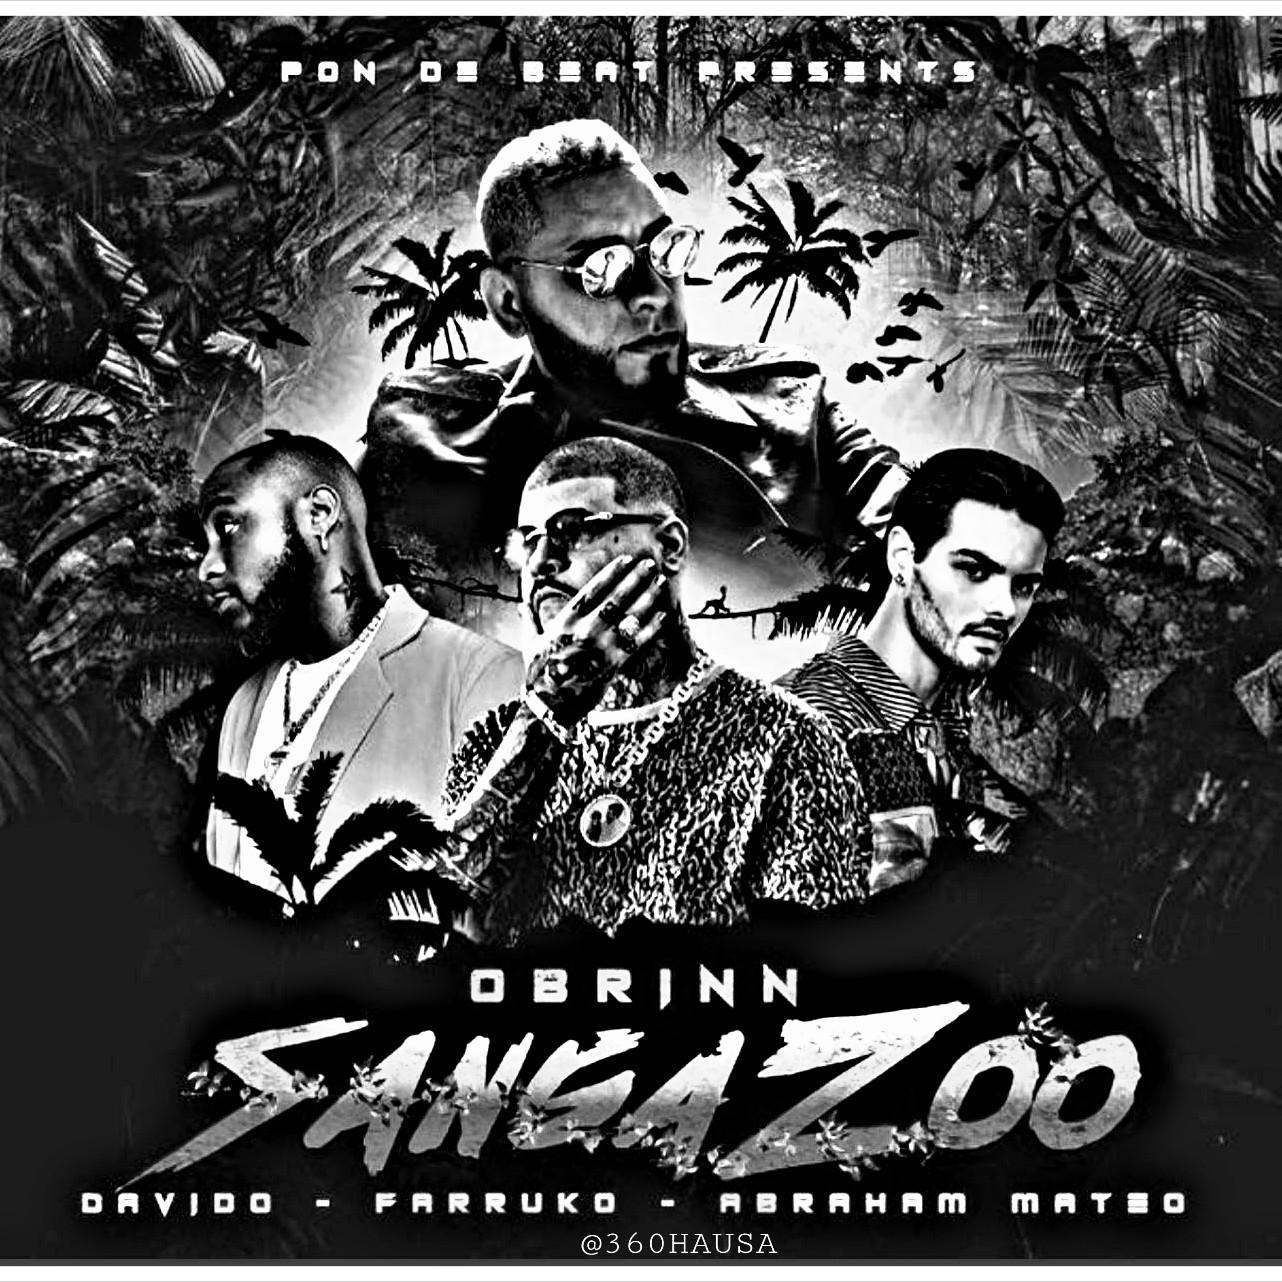 MUSIC: Obrinn Feat. Davido x Farruko x Abraham Mateo - Sangazoo Mp3 Download